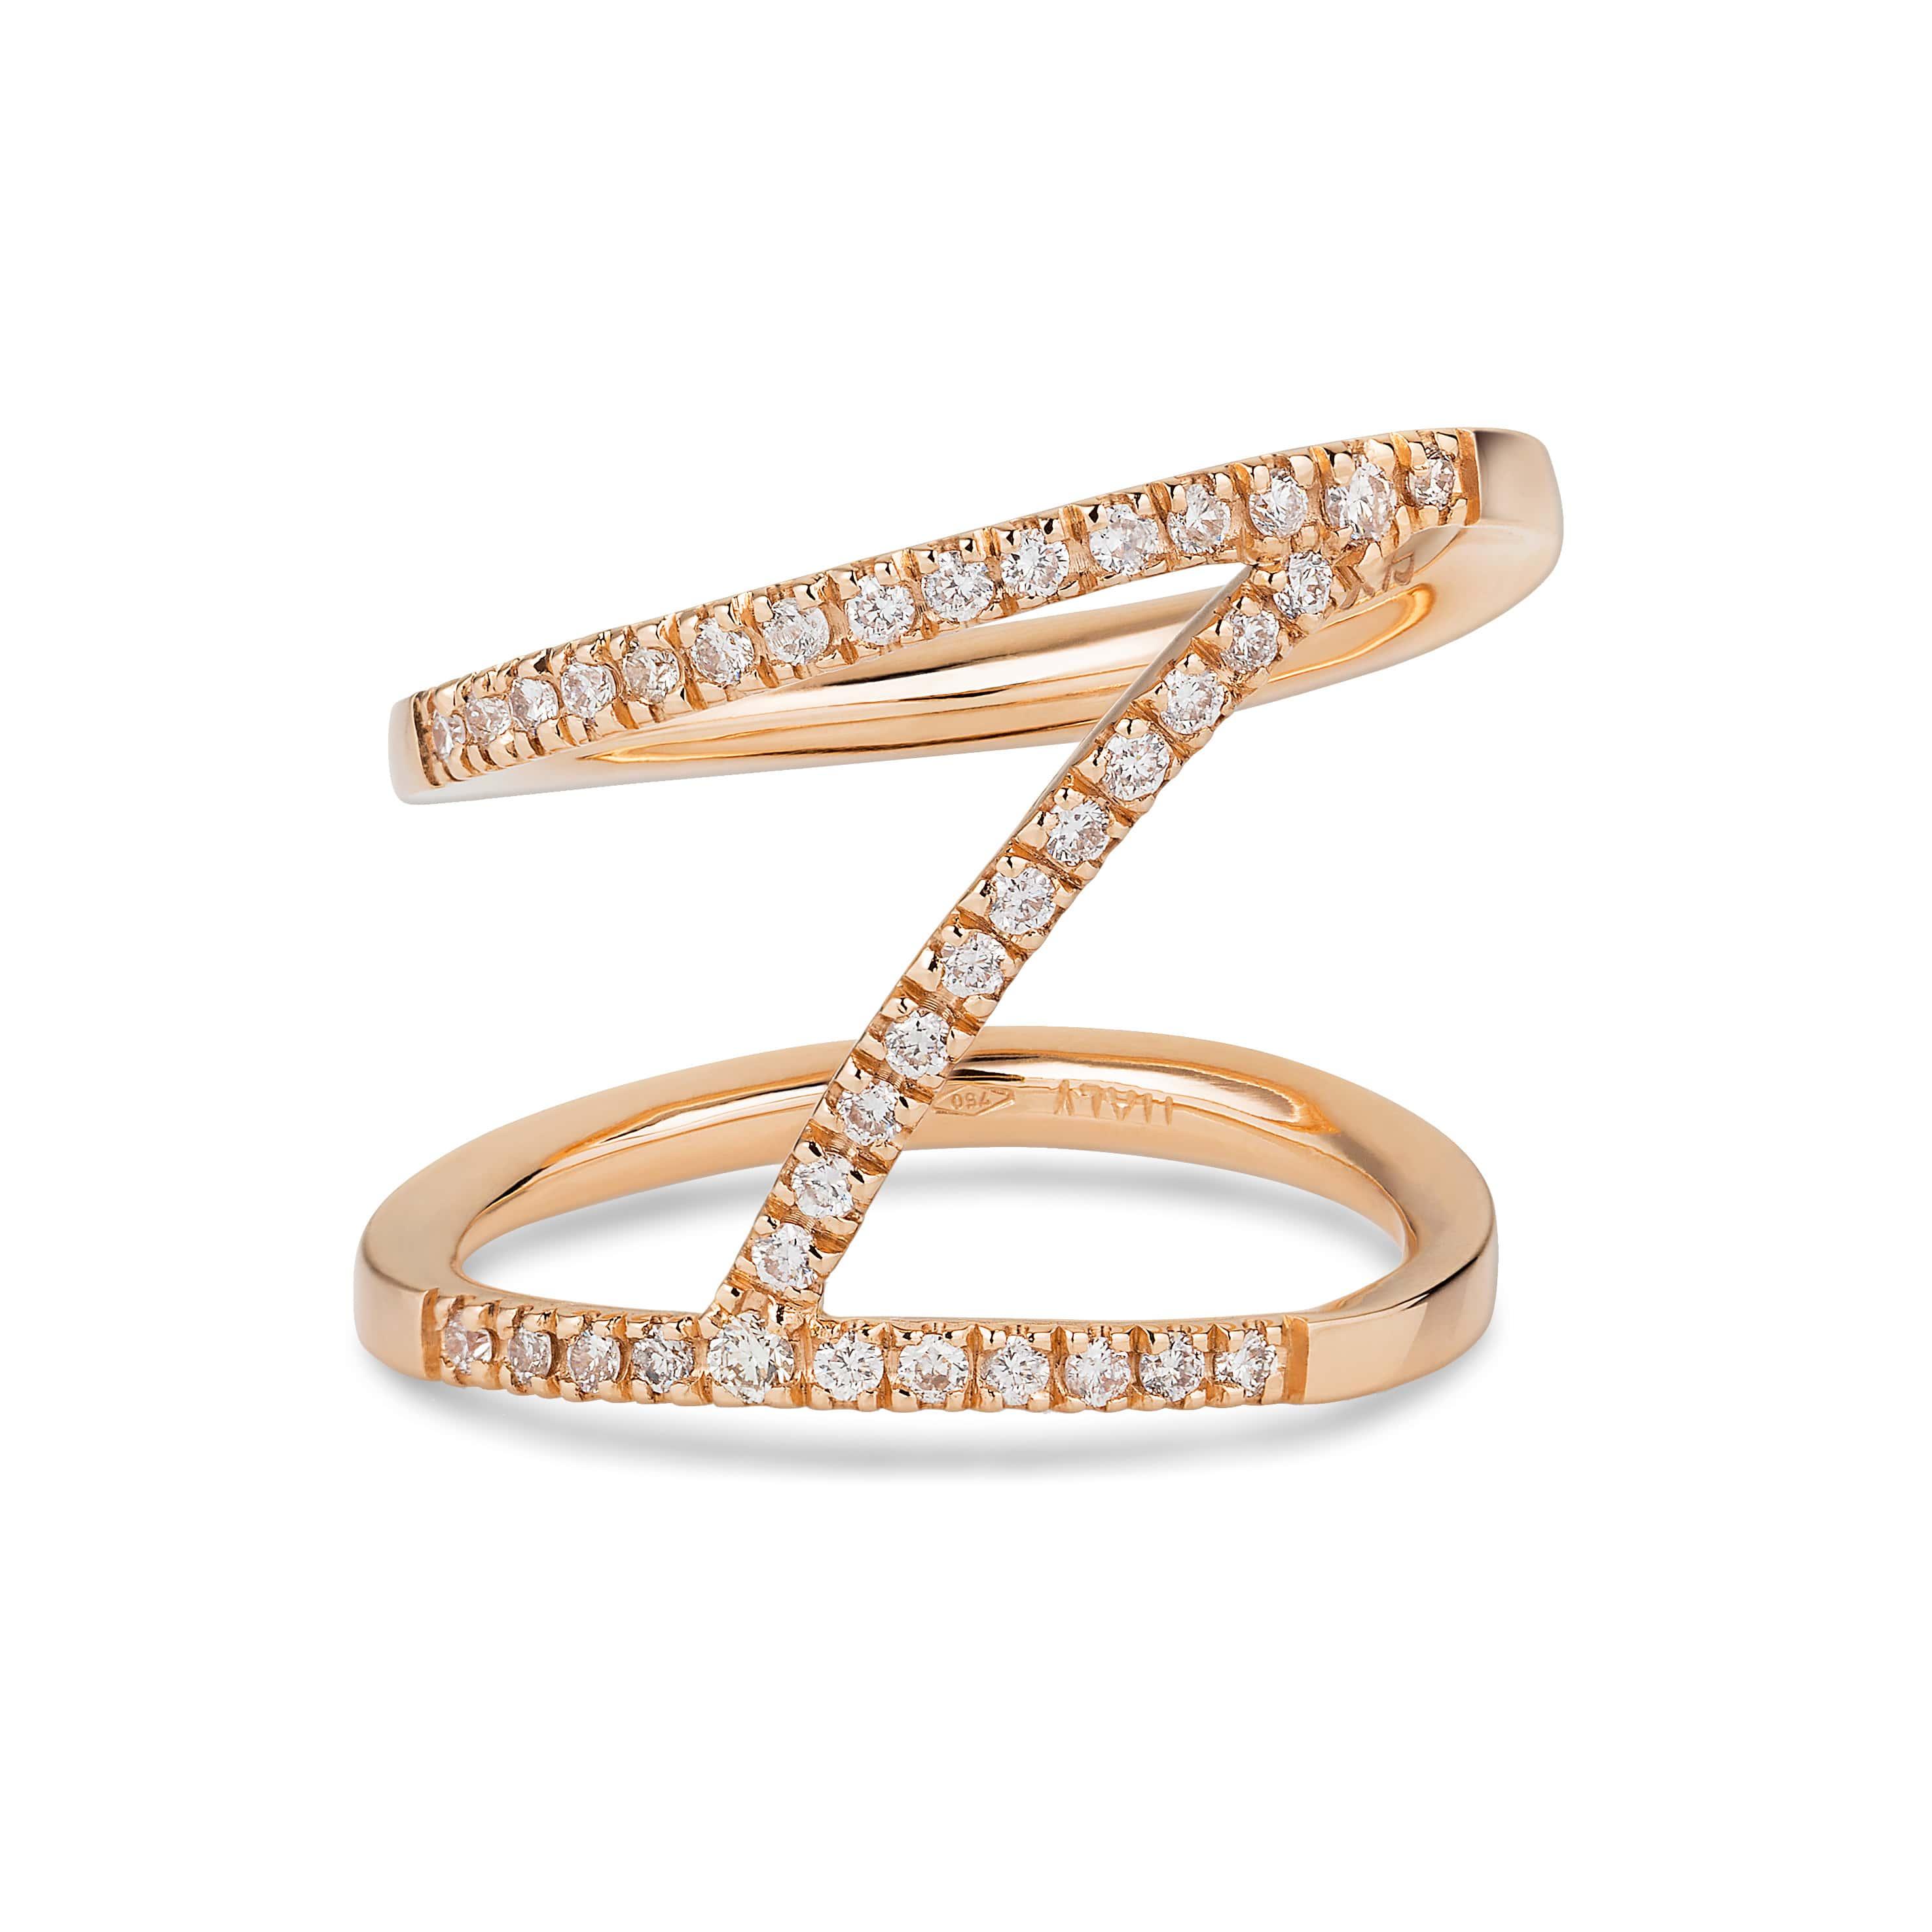 Numerati-No.1-in-18ct-rose-gold-and-white-diamonds-Sarah-Ho